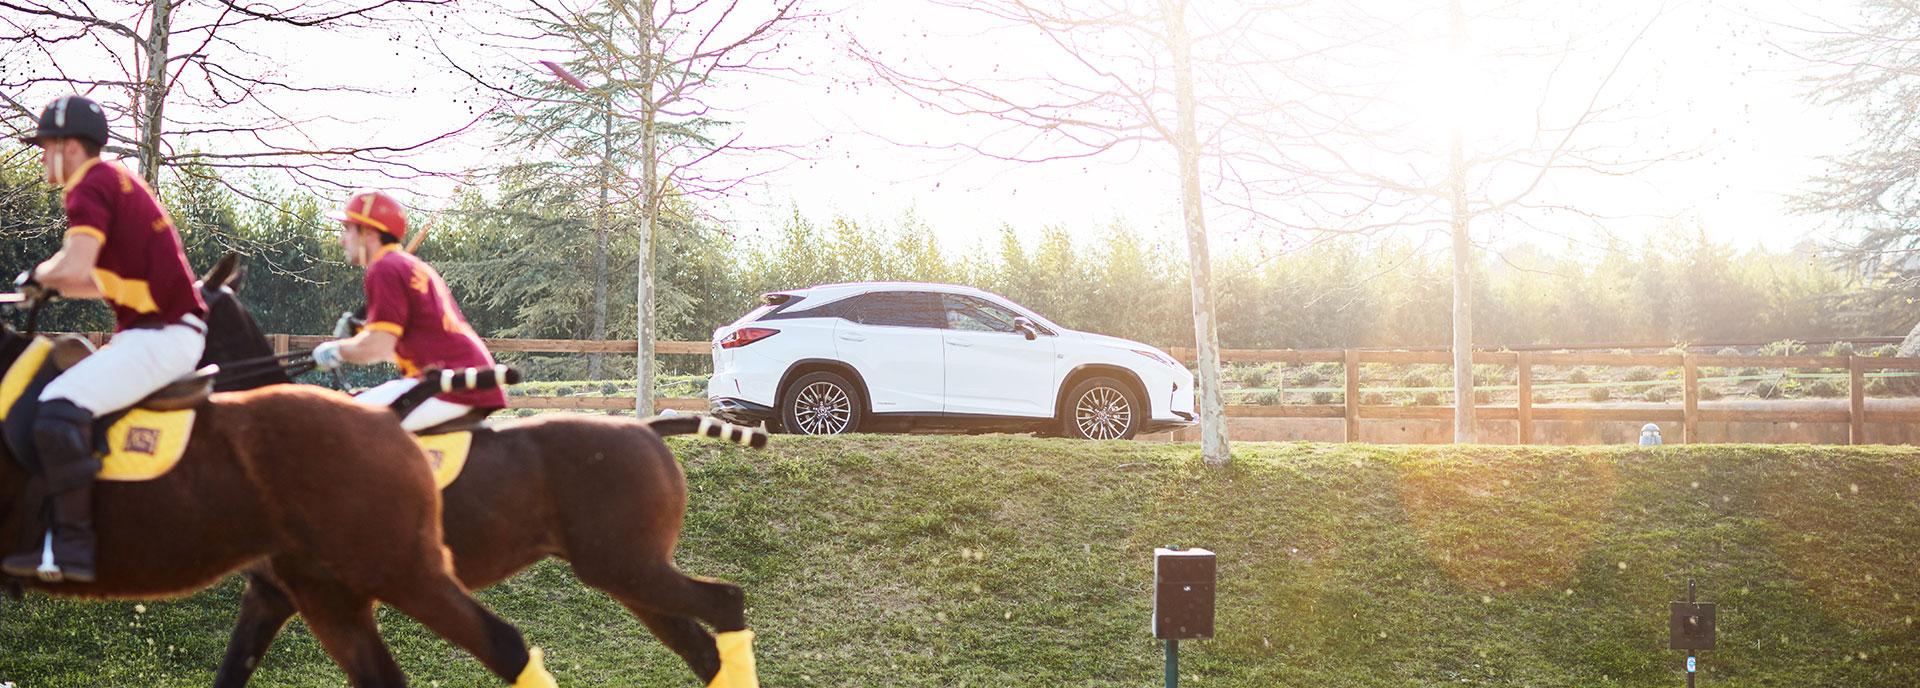 2017 Lexus RX 450h Life Promo